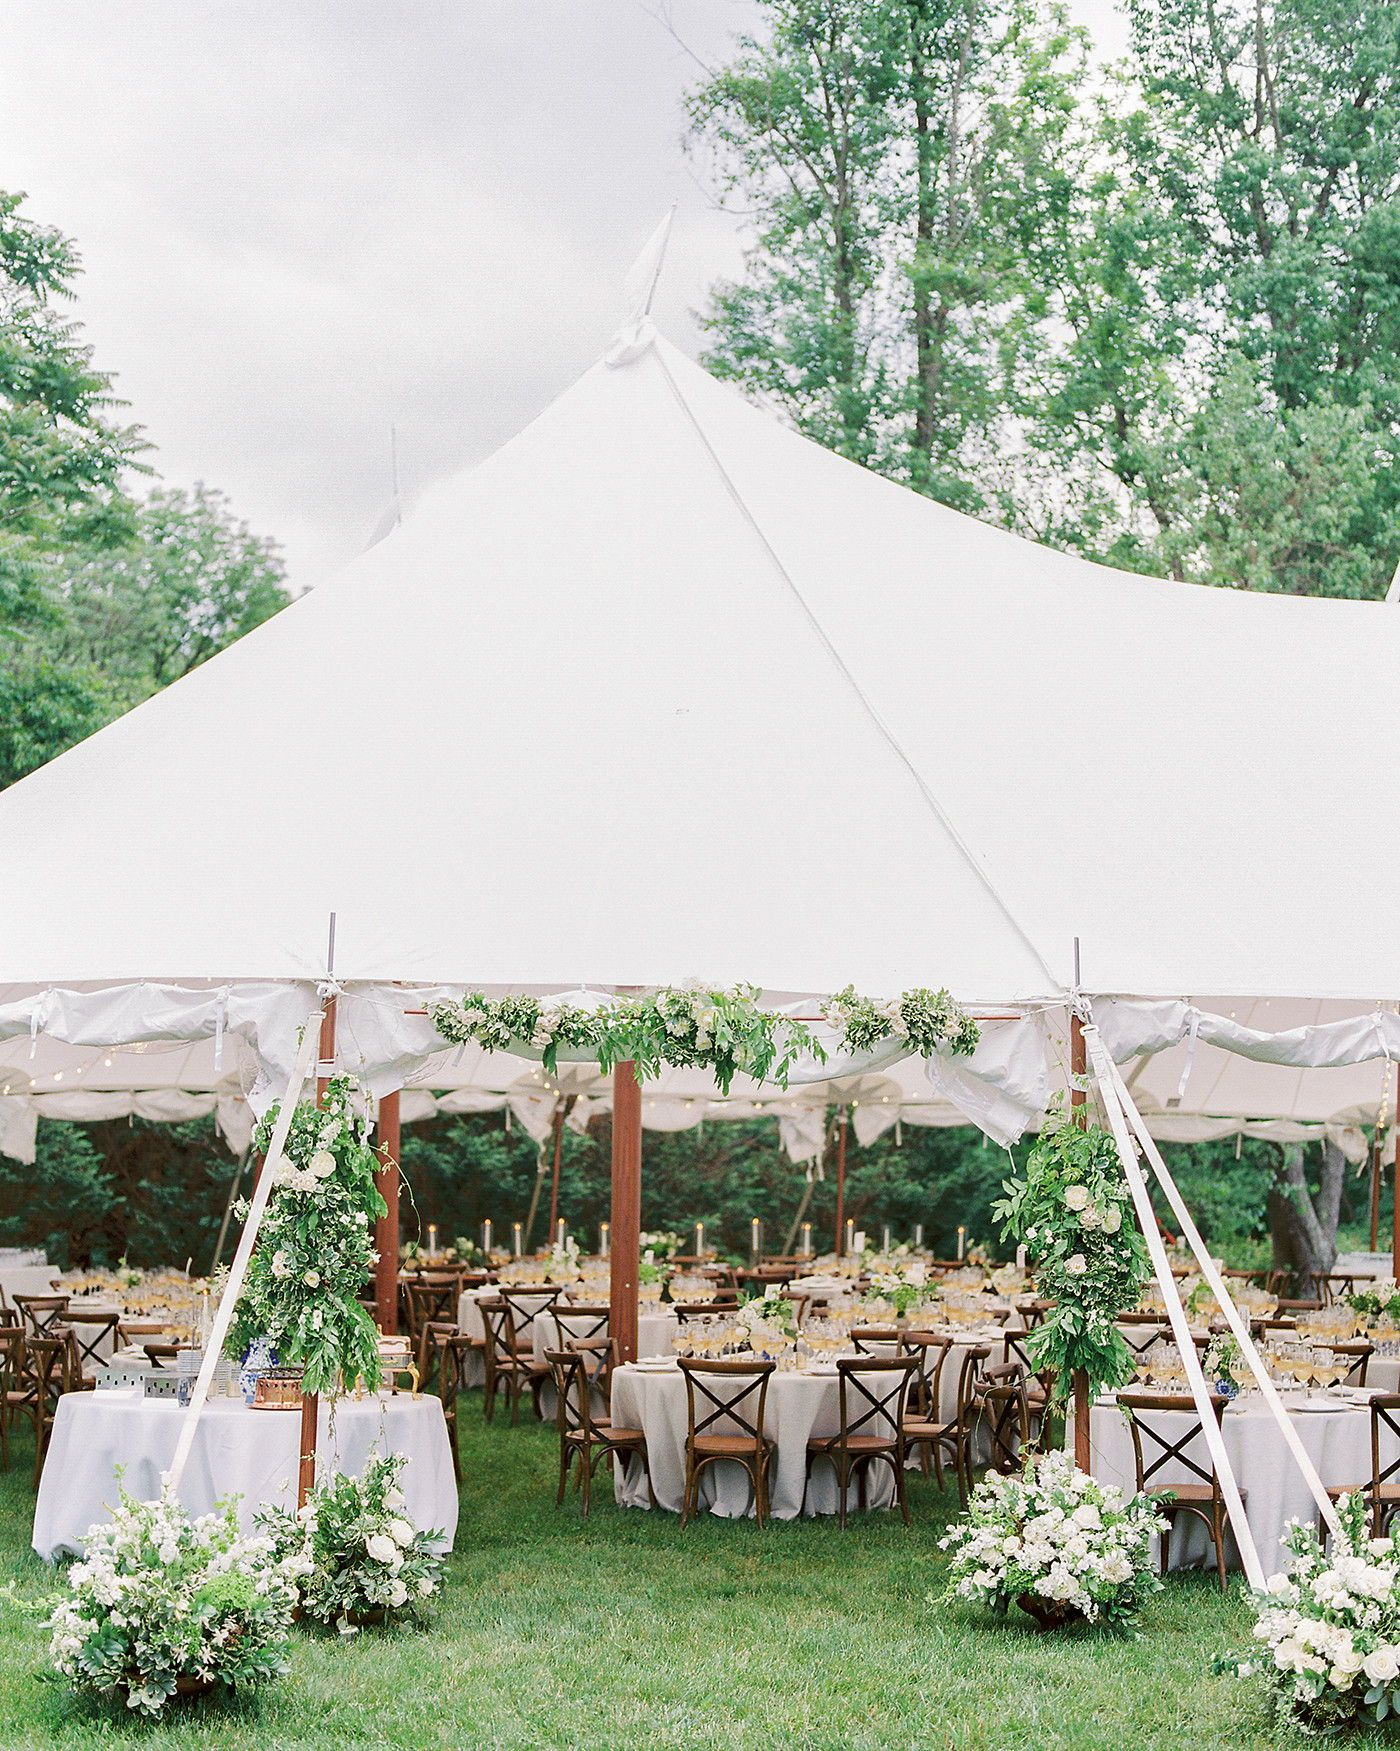 A Joyful Backyard Wedding At The Bride S Family Home Wedding Backyard Reception Tent Wedding Reception Tent Wedding